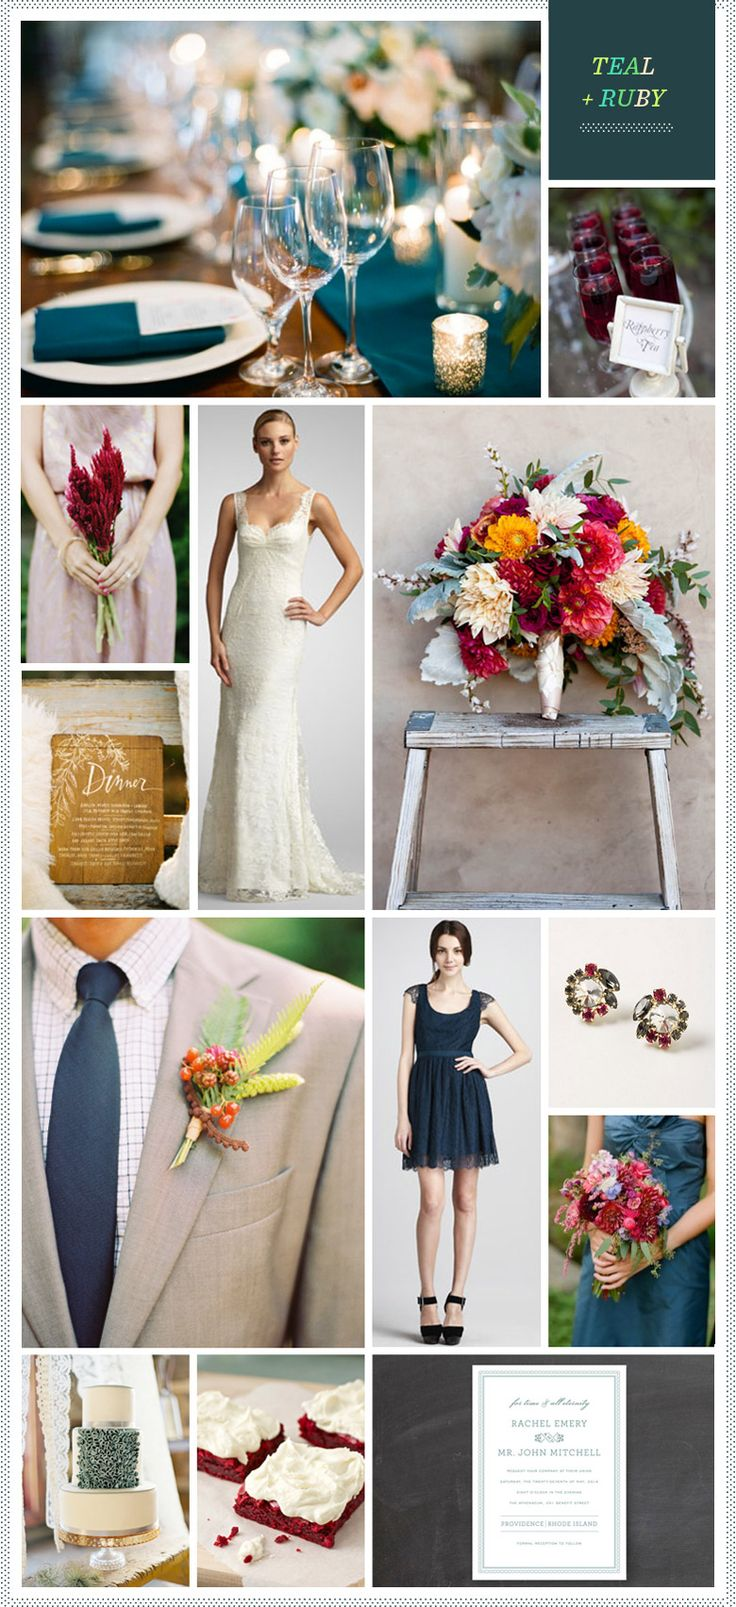 Teal + Ruby Wedding Inspiration